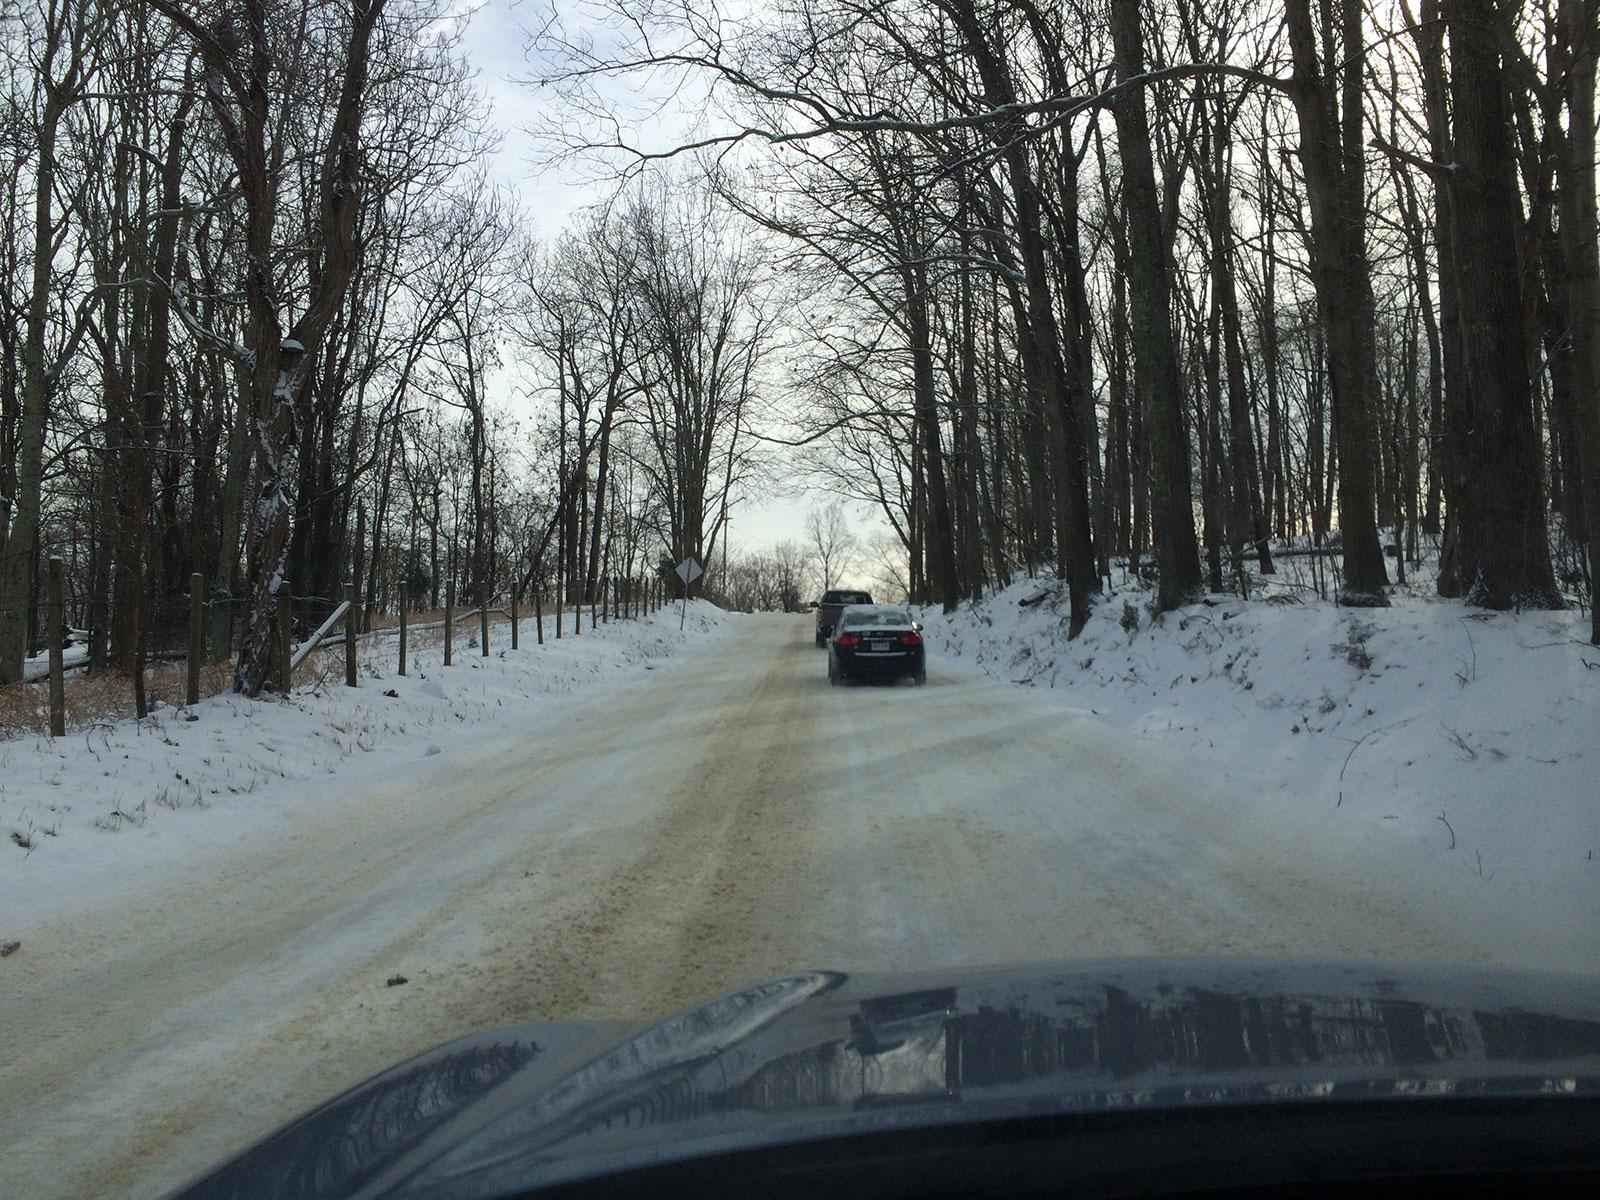 Snowpack roads